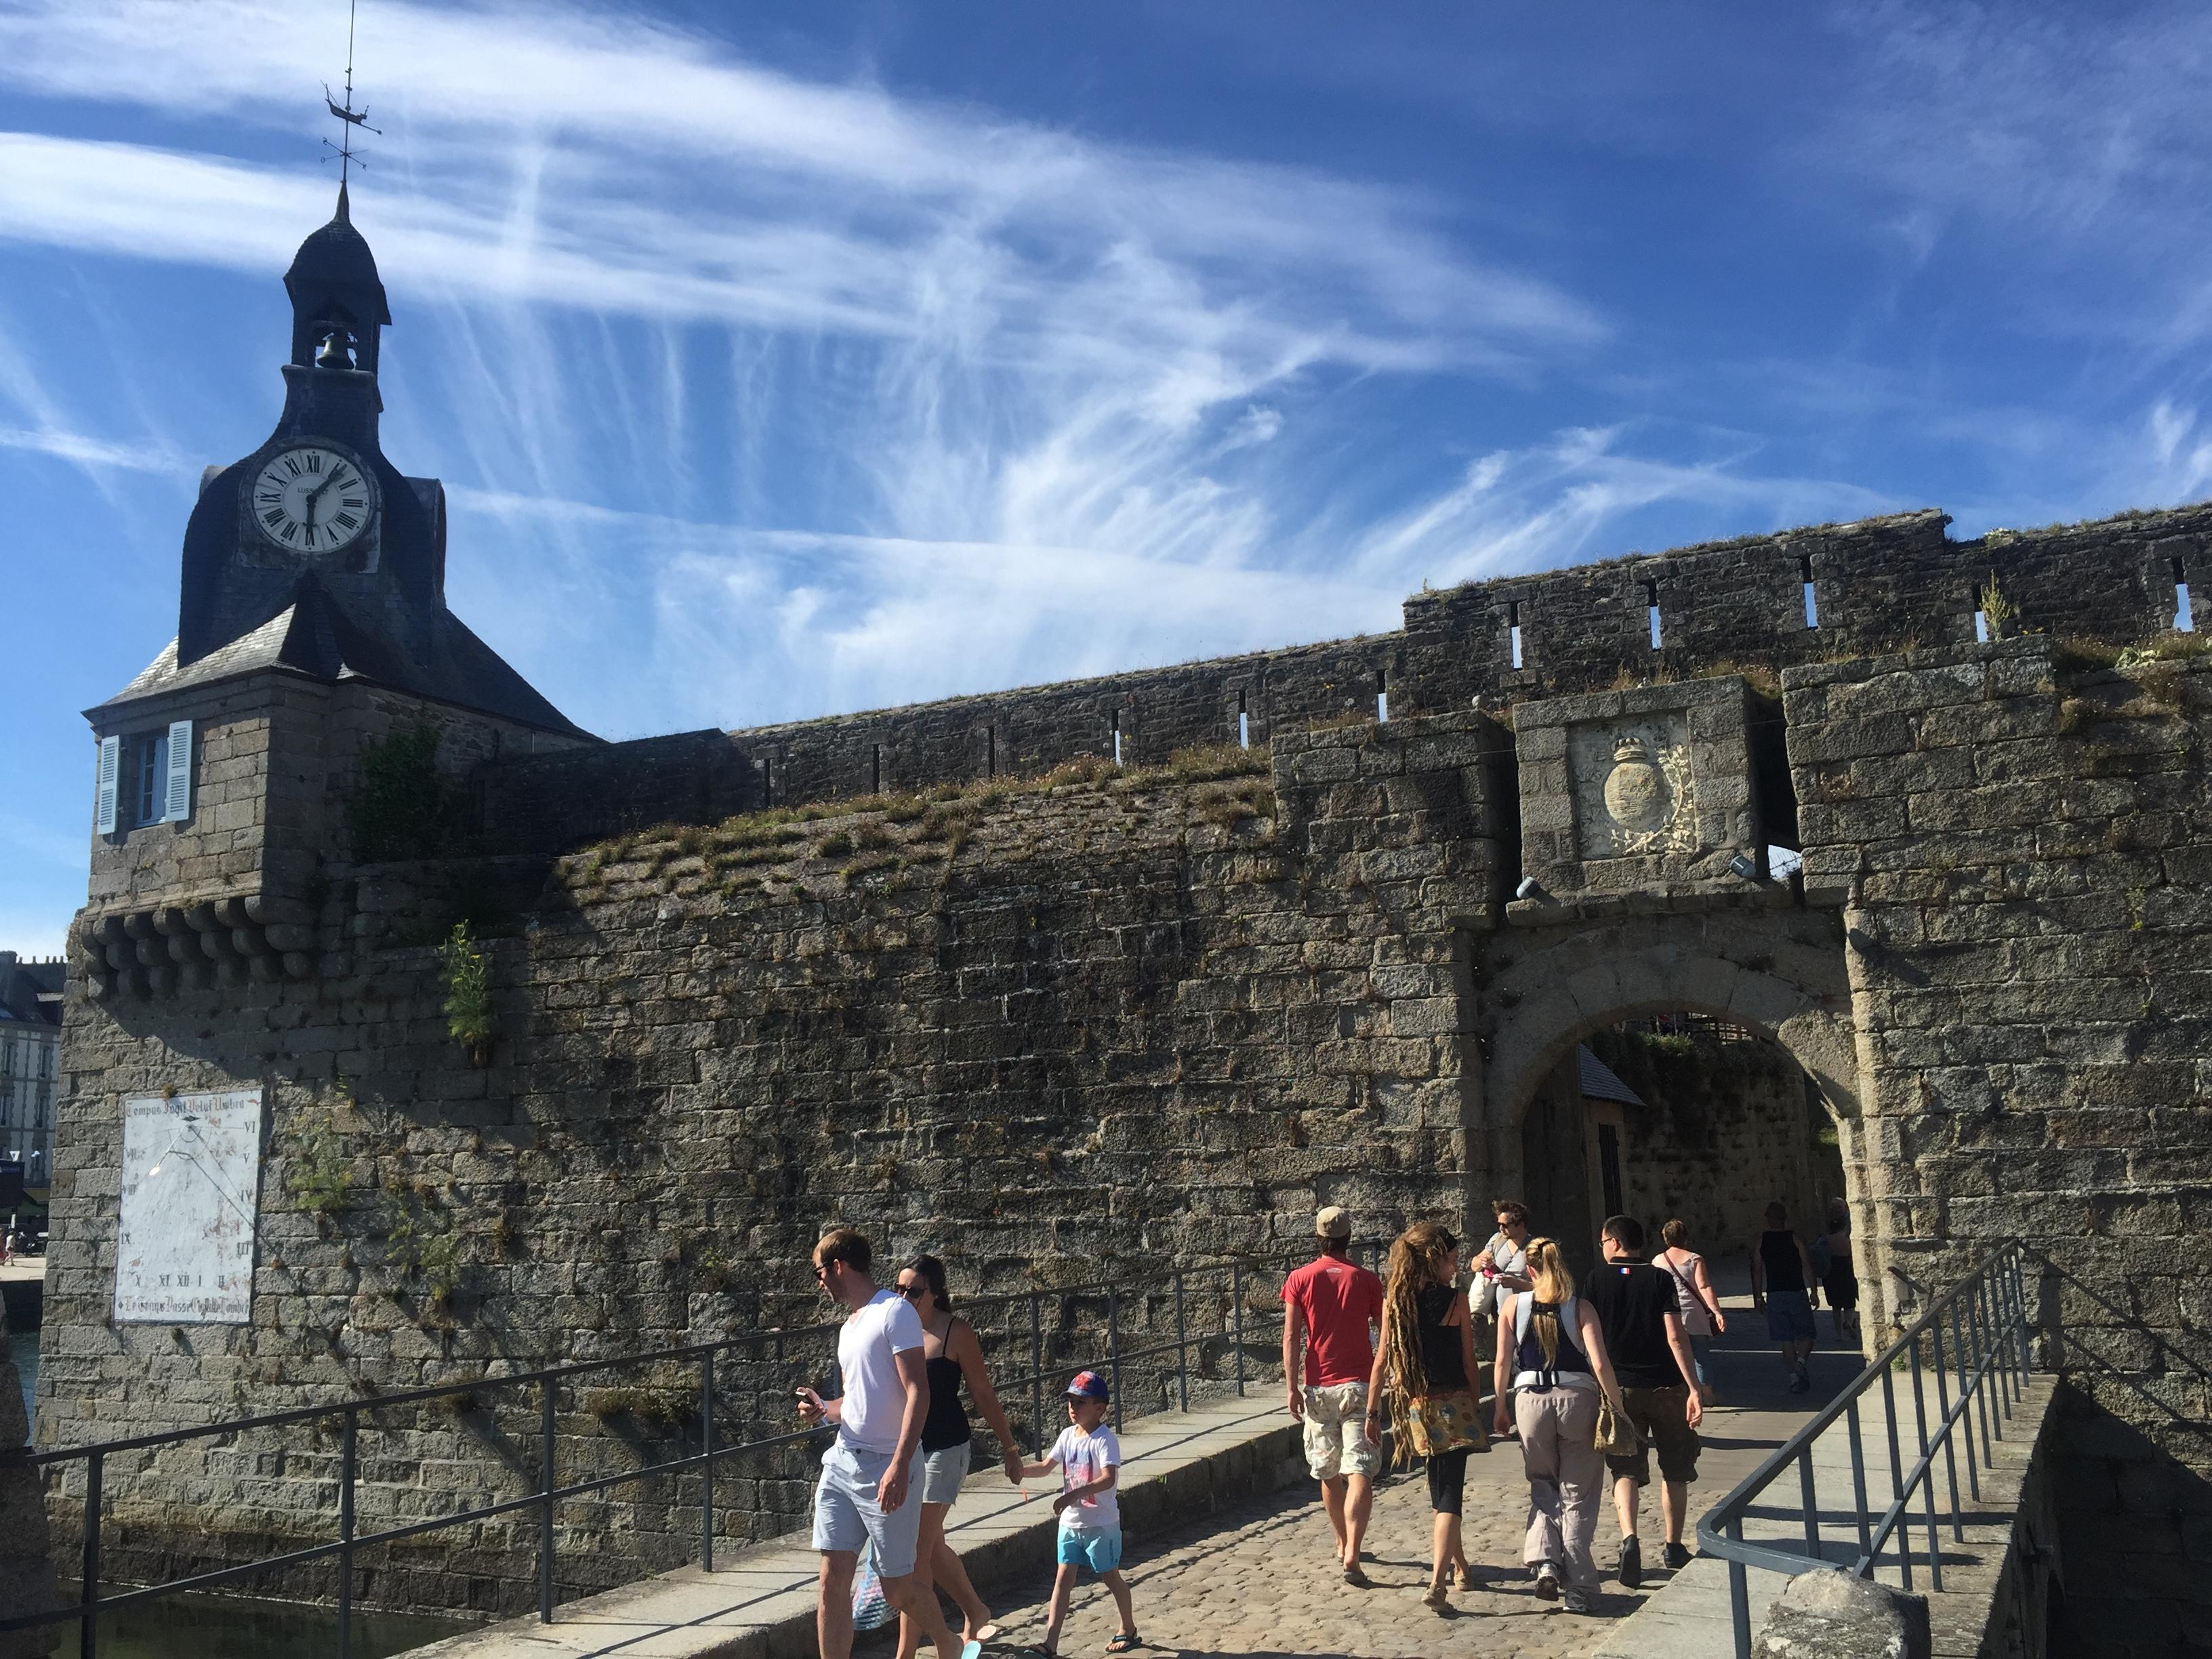 Bridge of the walled city of Concarneau (photo: SHD)